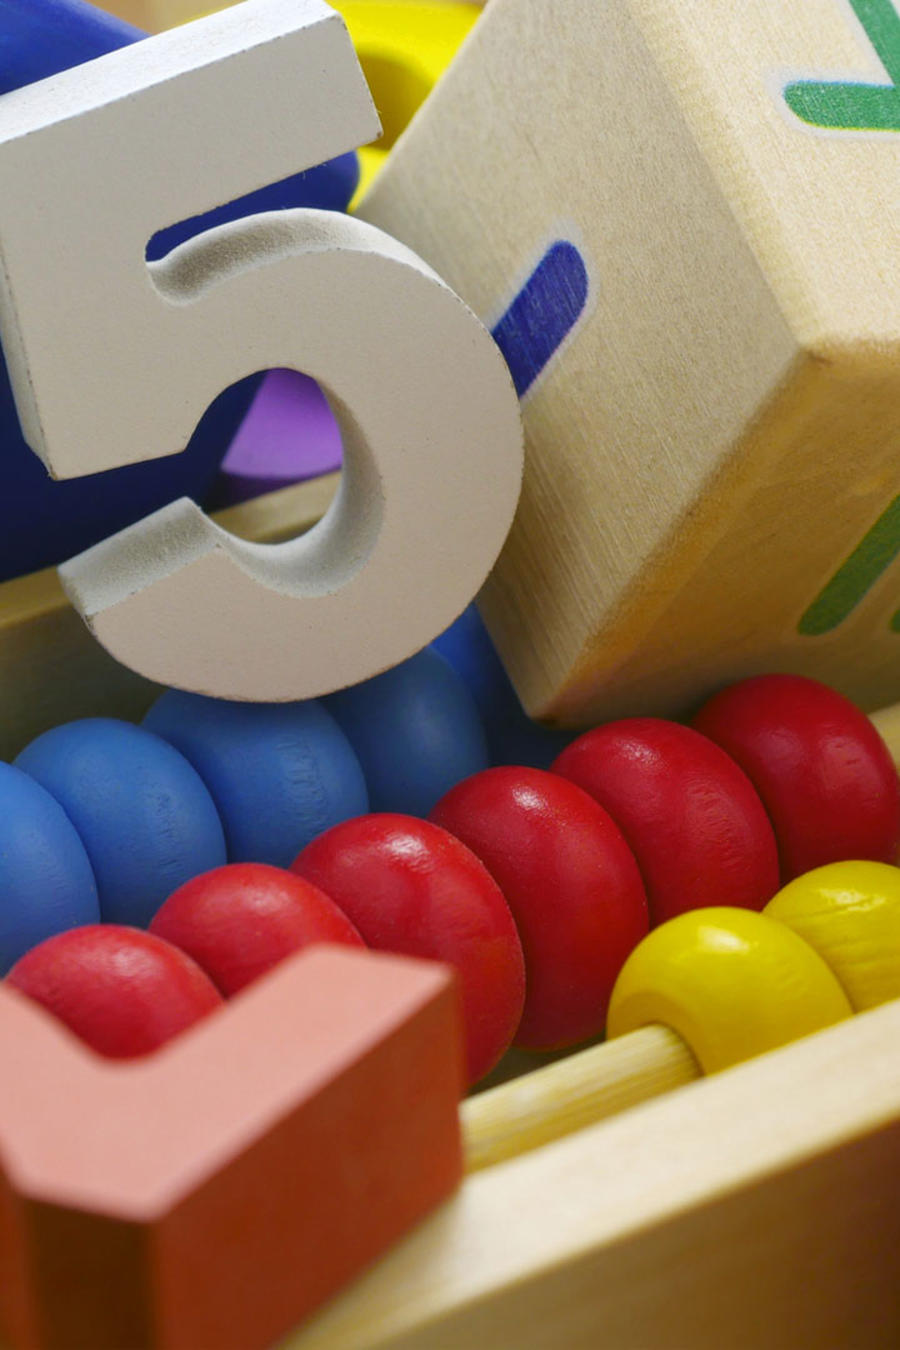 Juguetes de madera con números